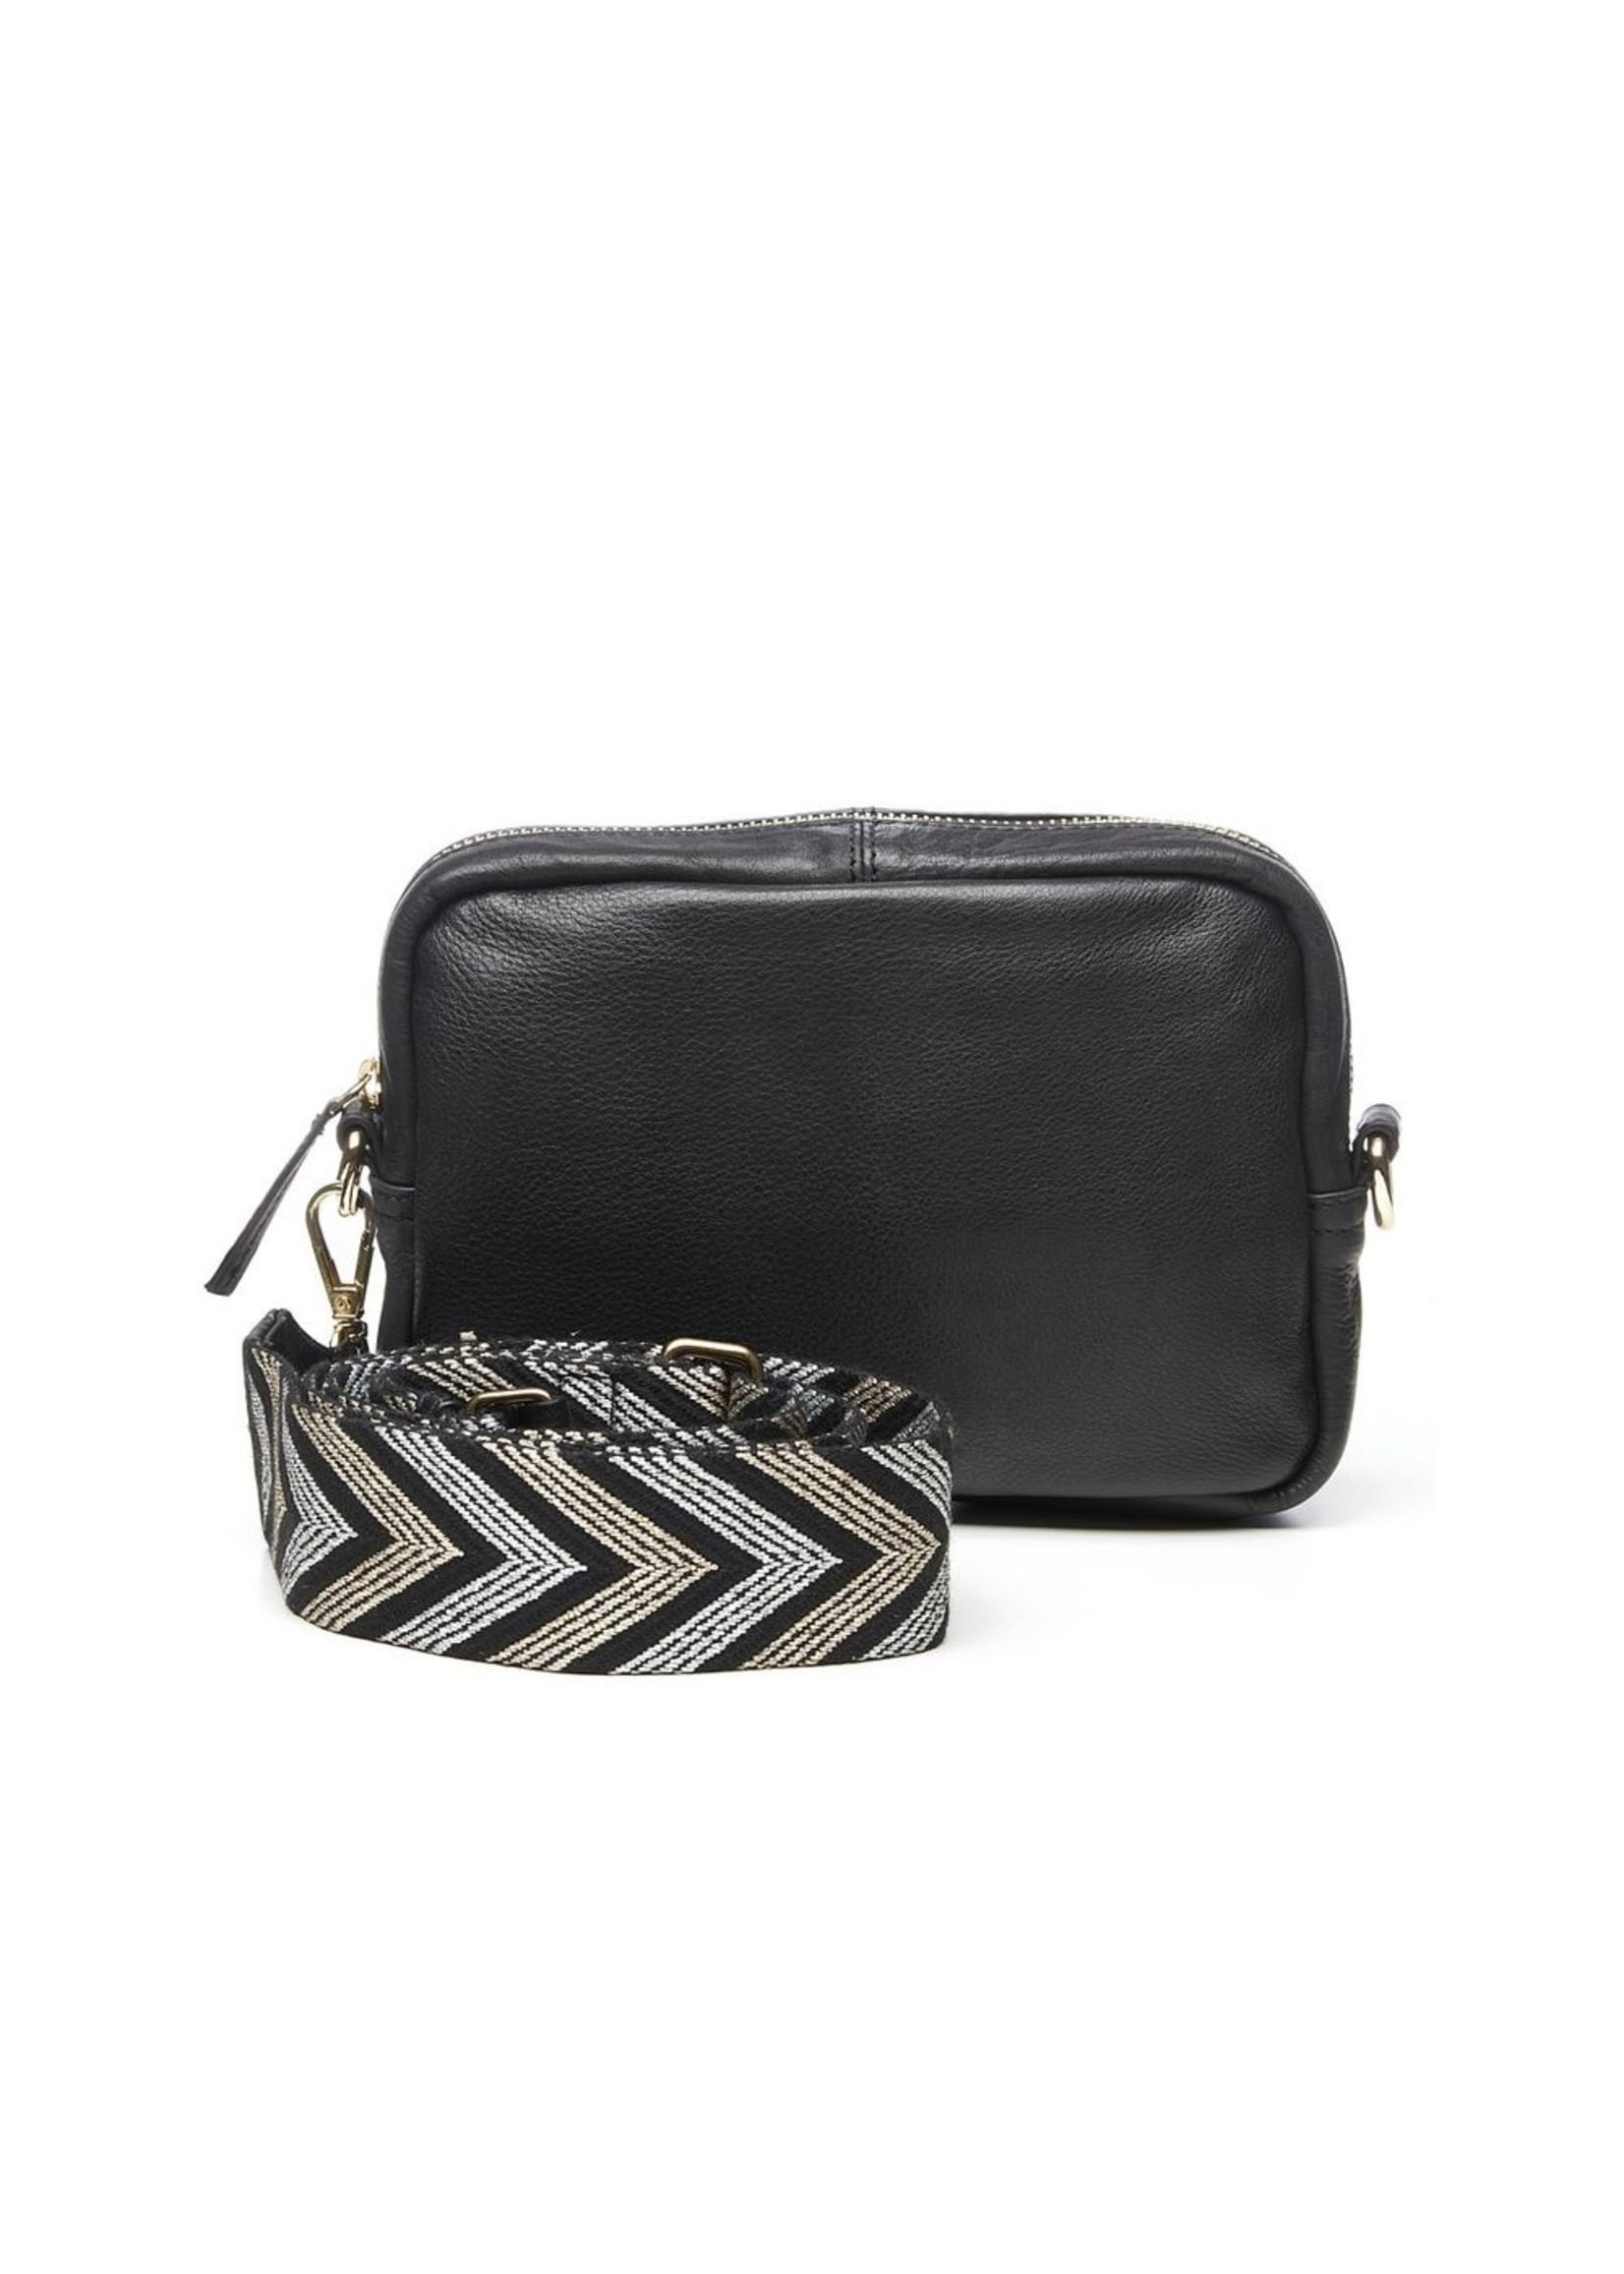 Chabo Bags Strap V Gold